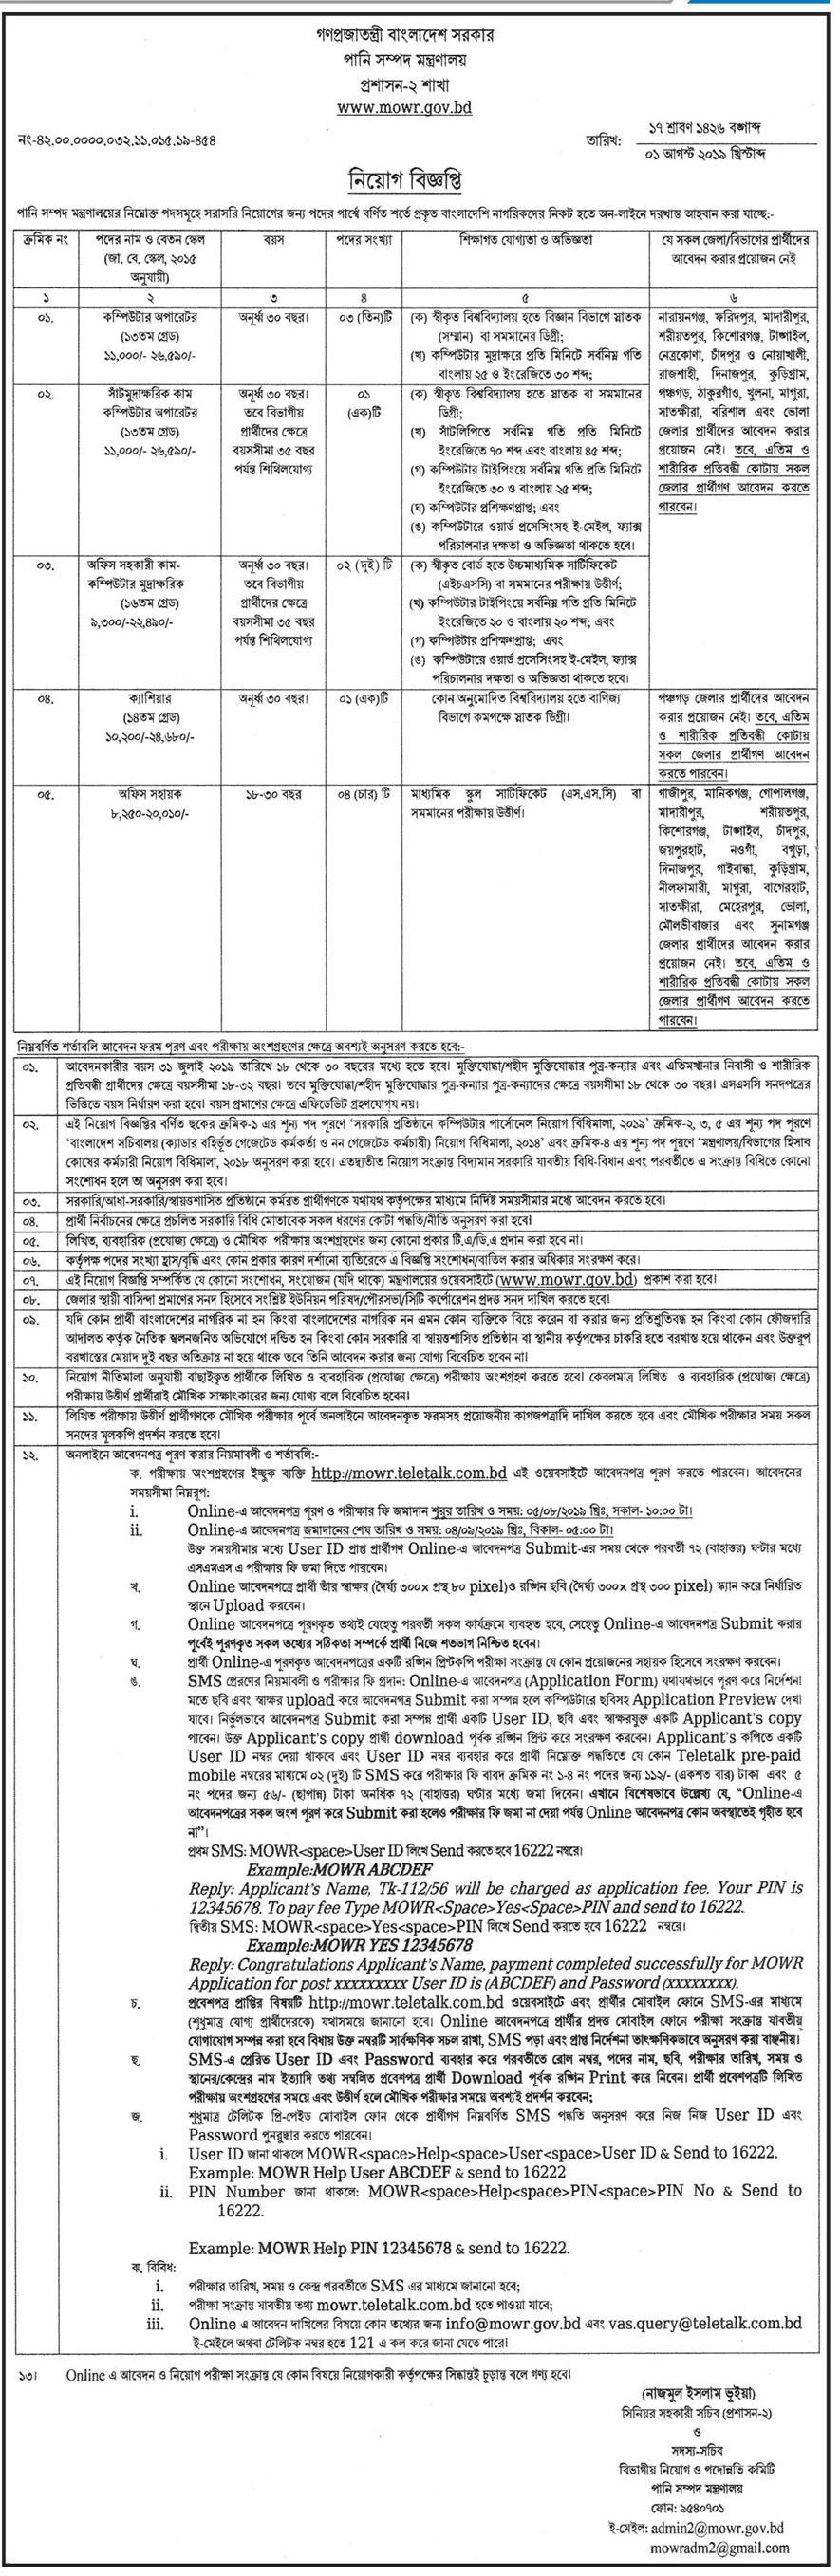 Ministry of Water Resources Job Circular 2020